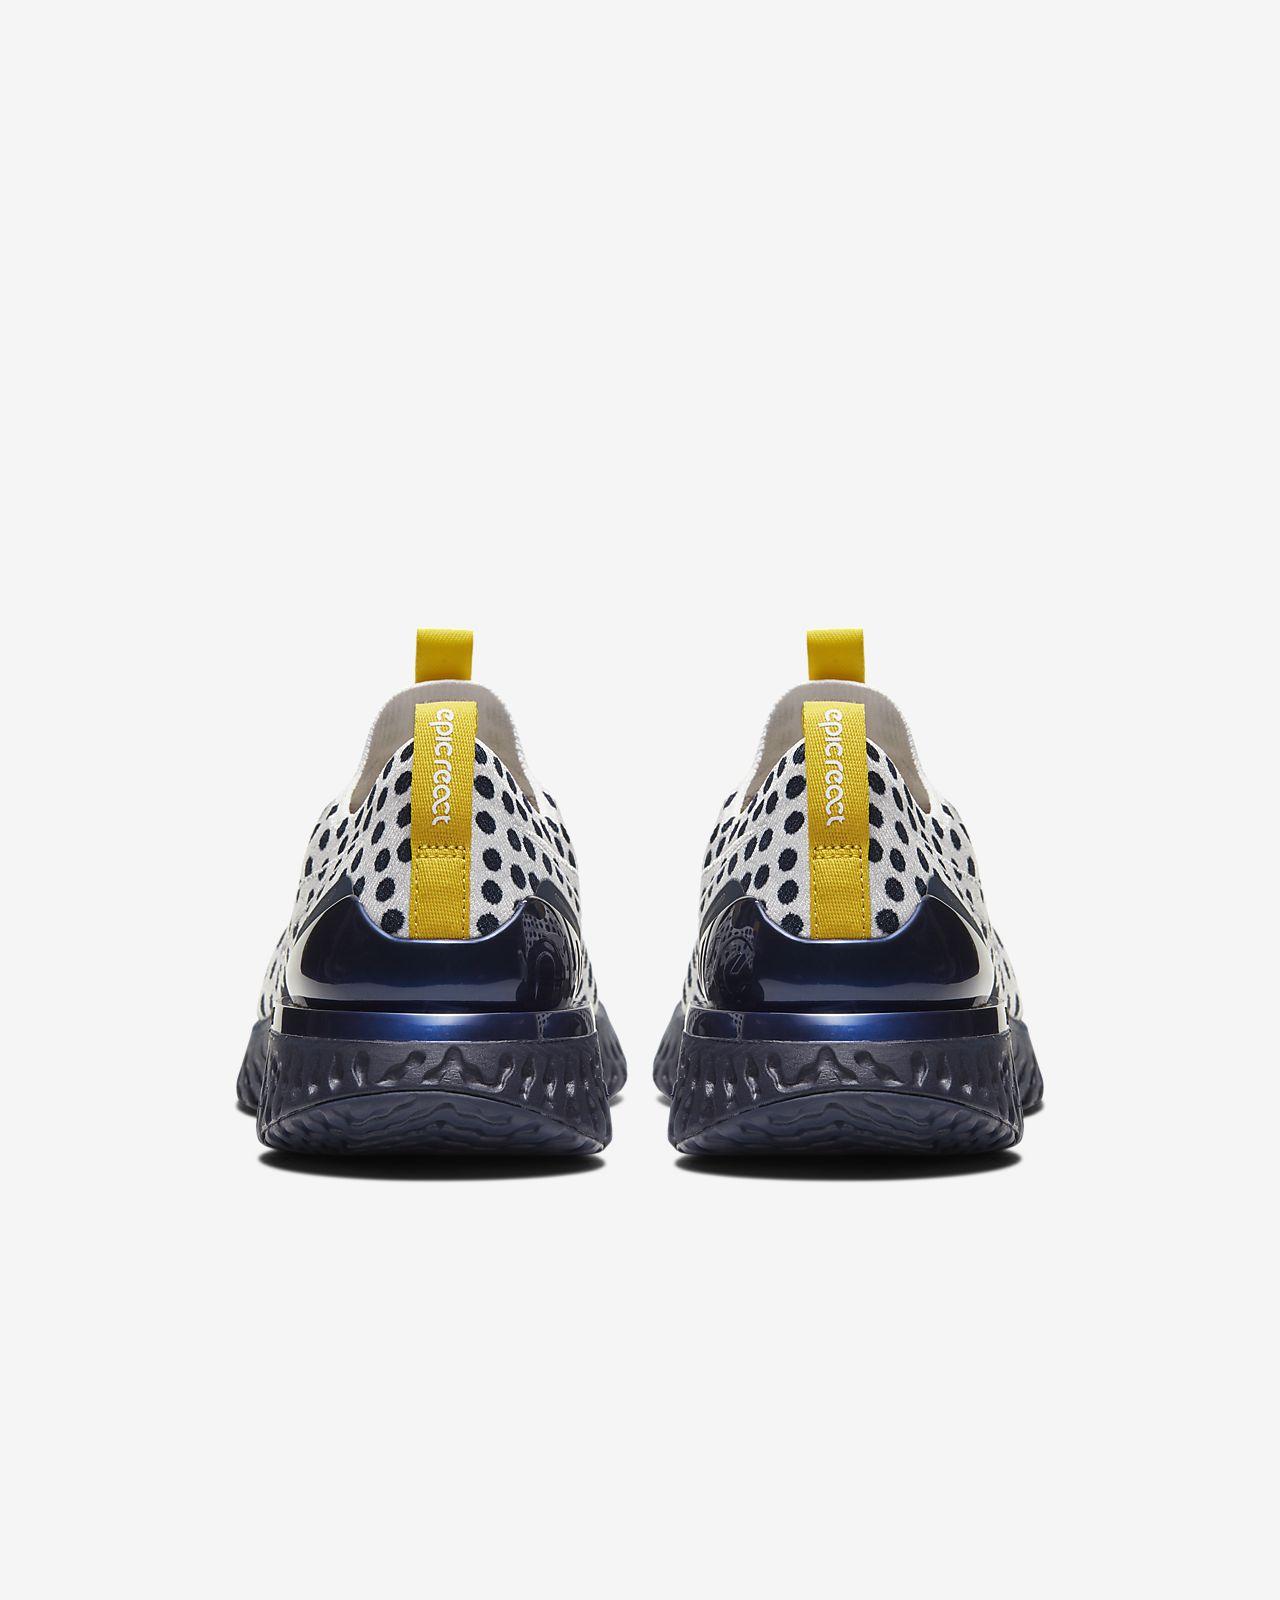 Scarpa da running Nike Epic Phantom React A.I.R. Cody Hudson Uomo